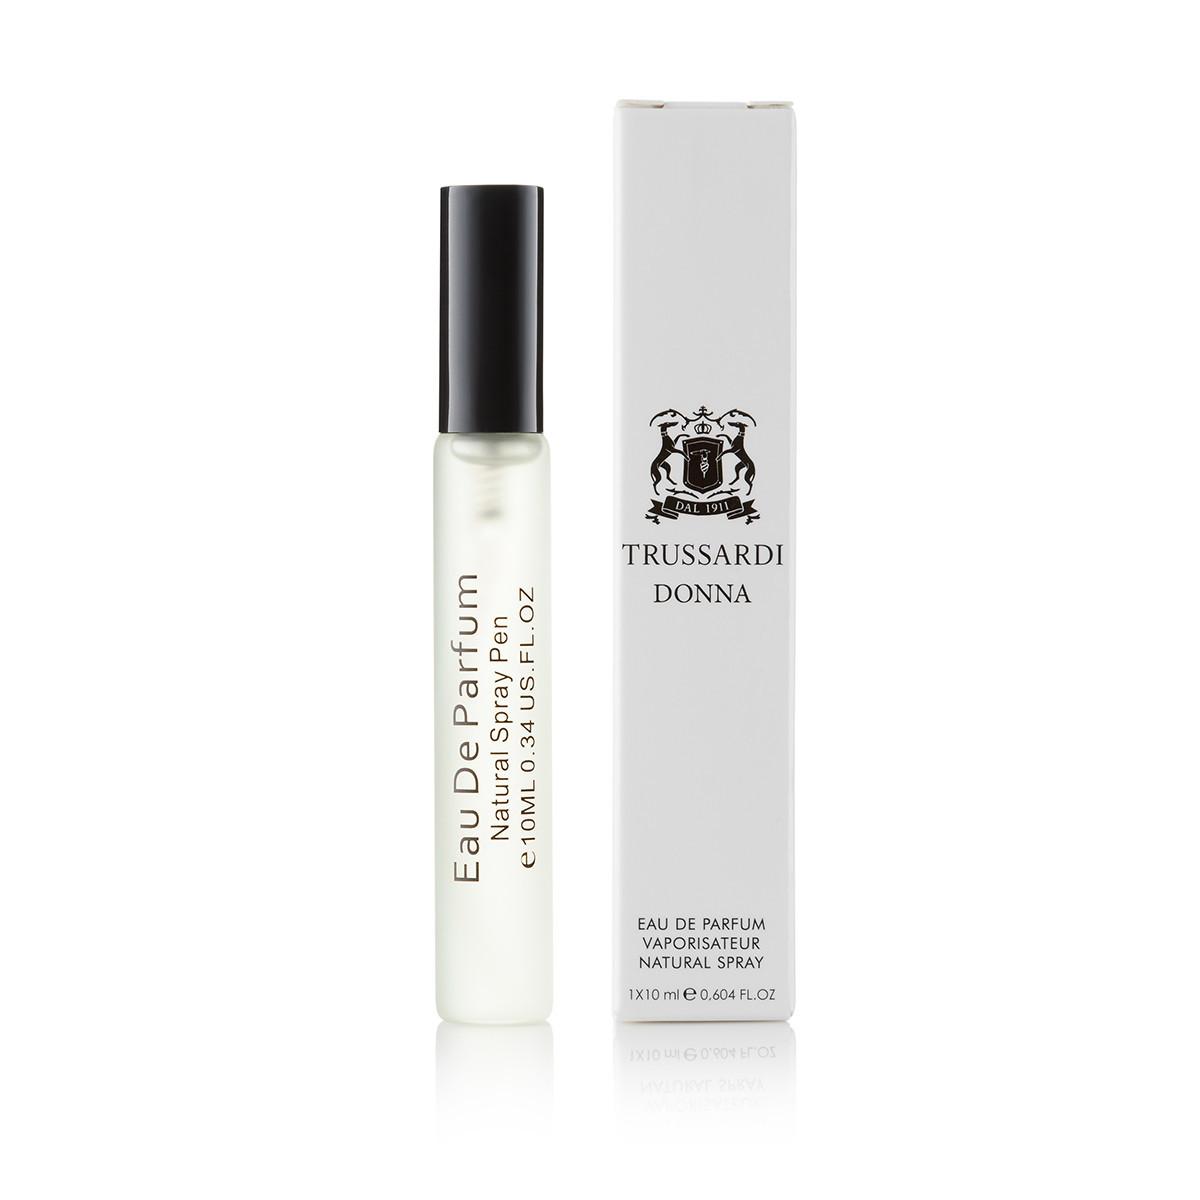 10 мл мини парфюм в ручкеTrussardi Donna (Ж) Д-82